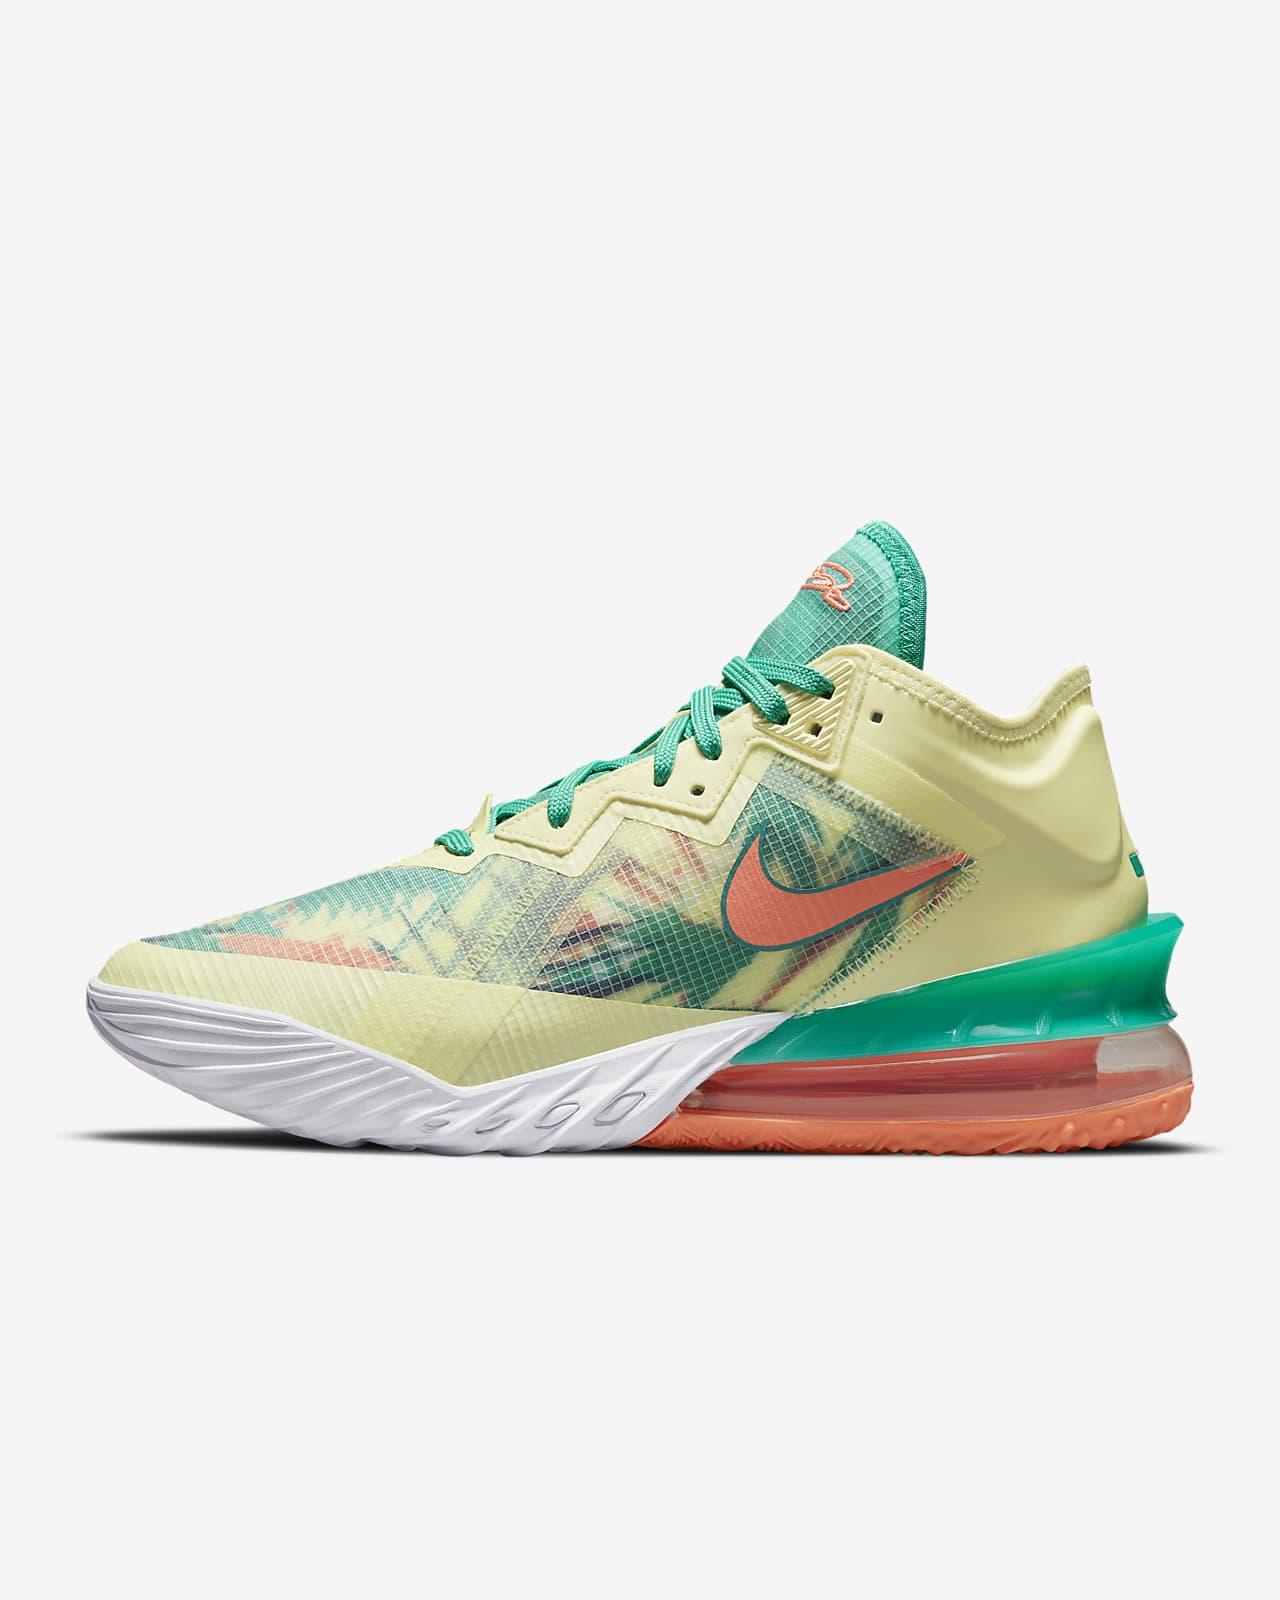 LeBron 18 Low 'Summer Refresh' Basketball Shoe